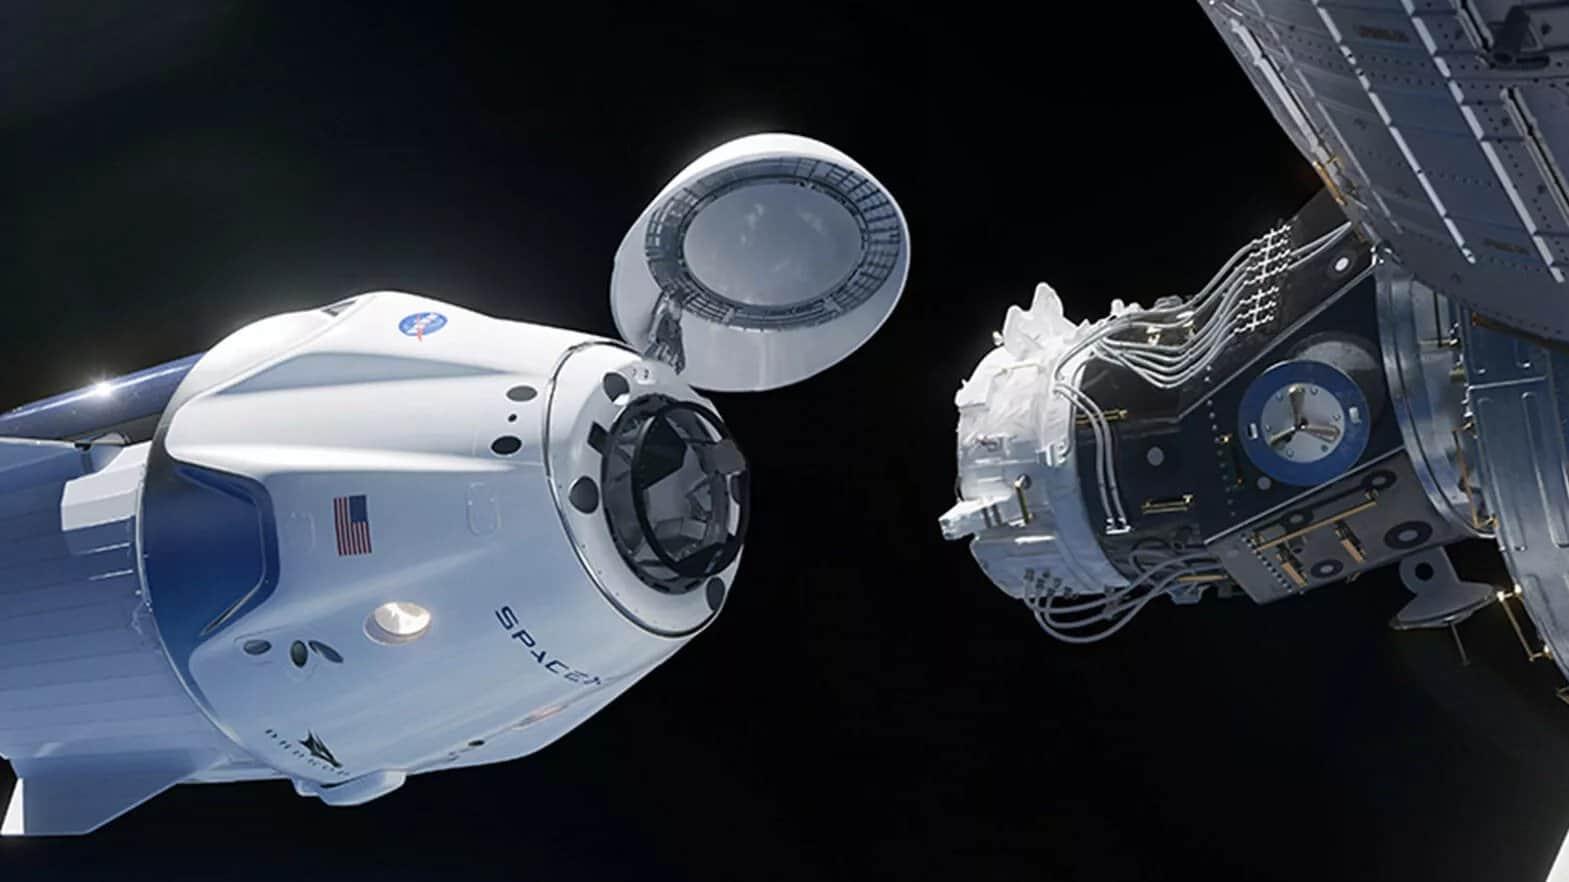 Spacex-Nasa-Crew-Dragon-Spacecraft